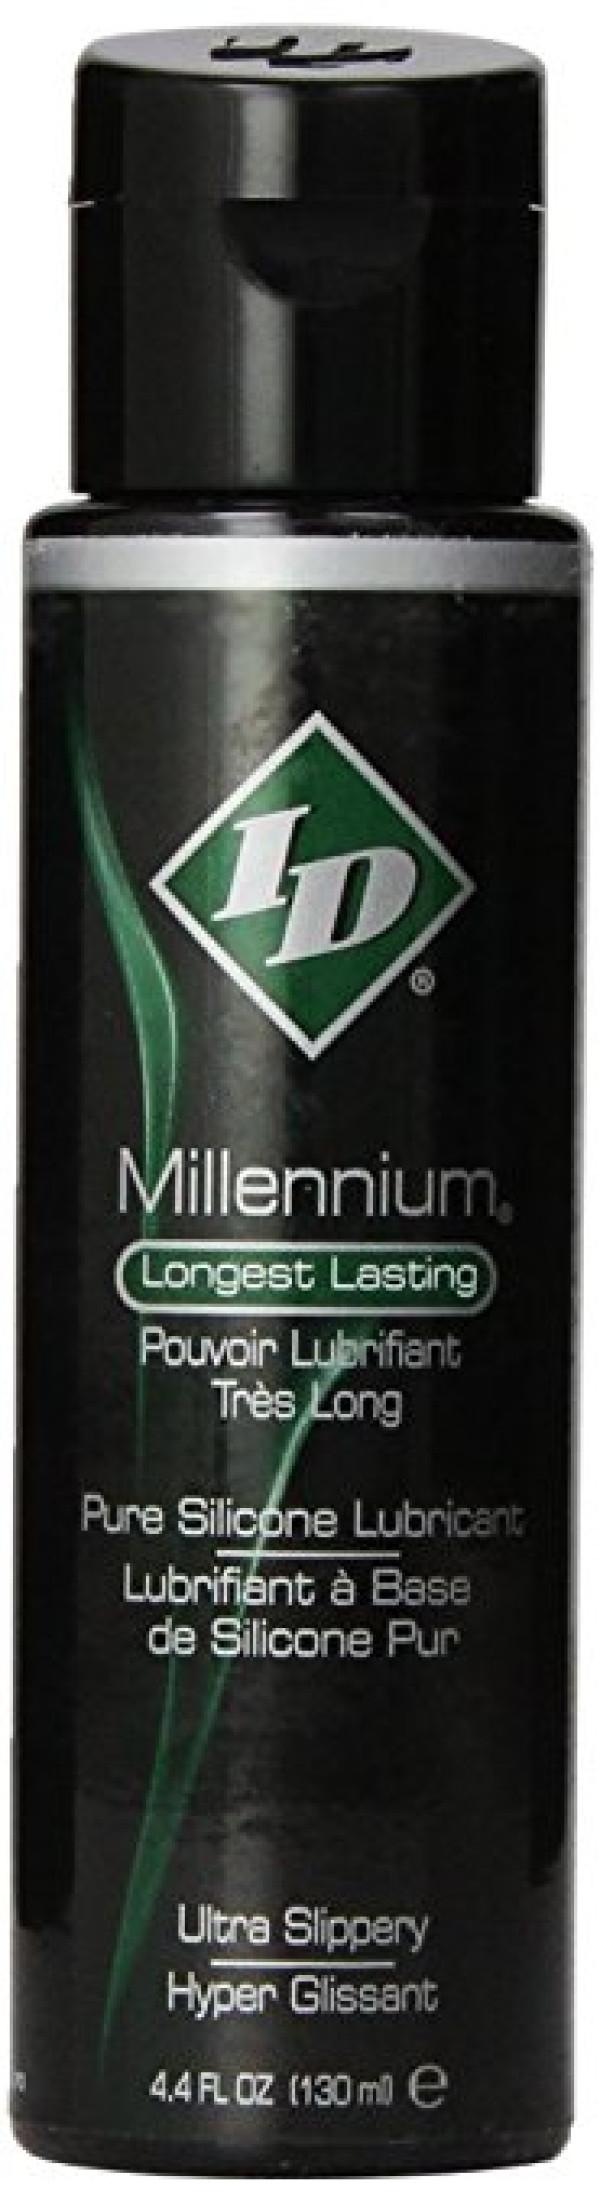 ID Millennium Longest Lasting Pure Silicone Lubricant 4.4 fl oz